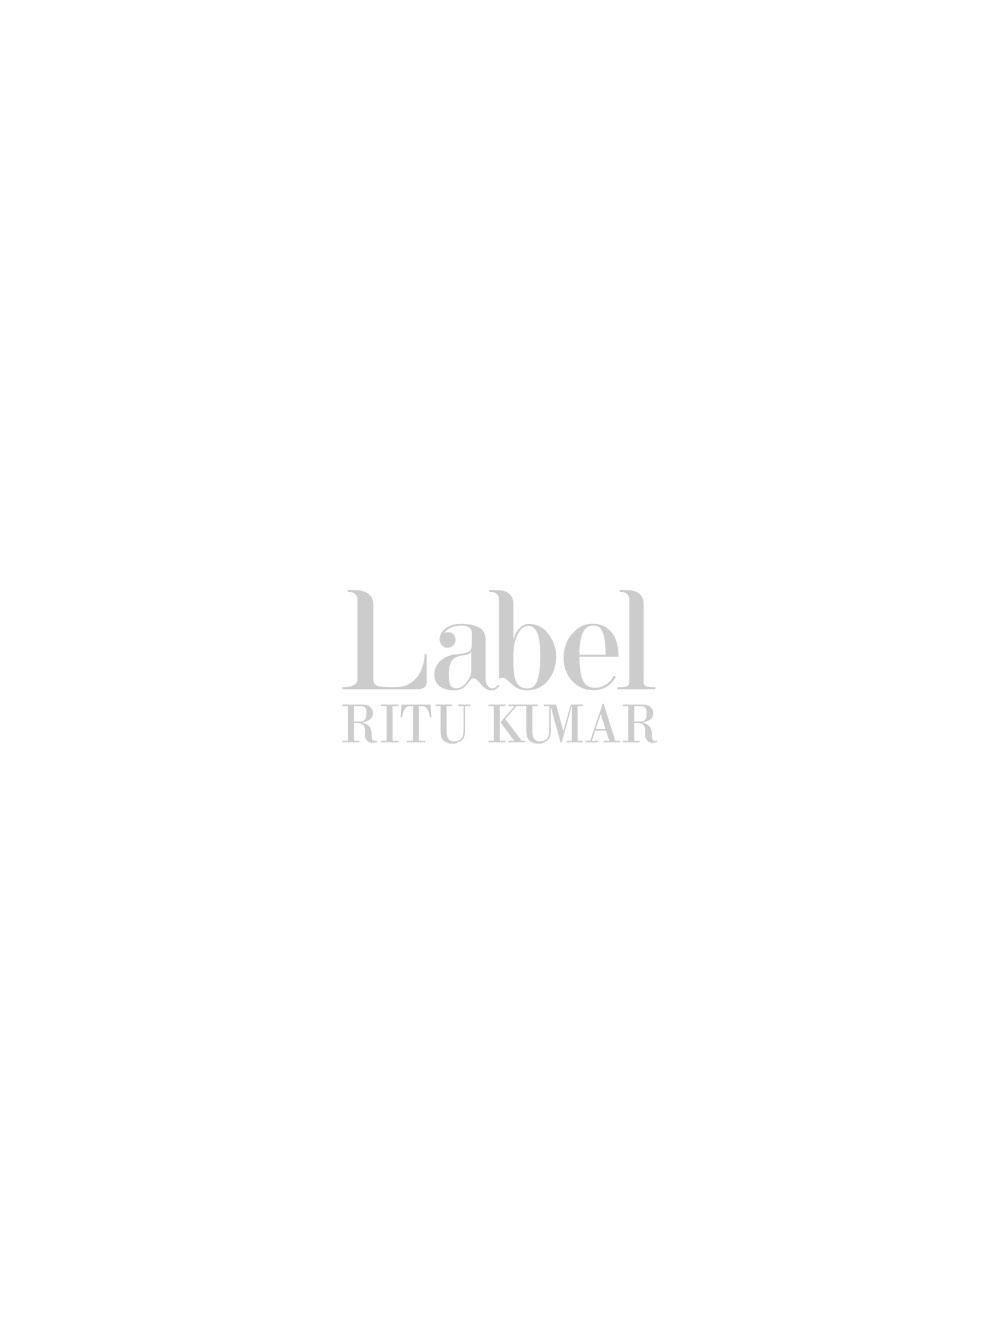 Katrina Kaif's Off The Shoulder White Long Dress